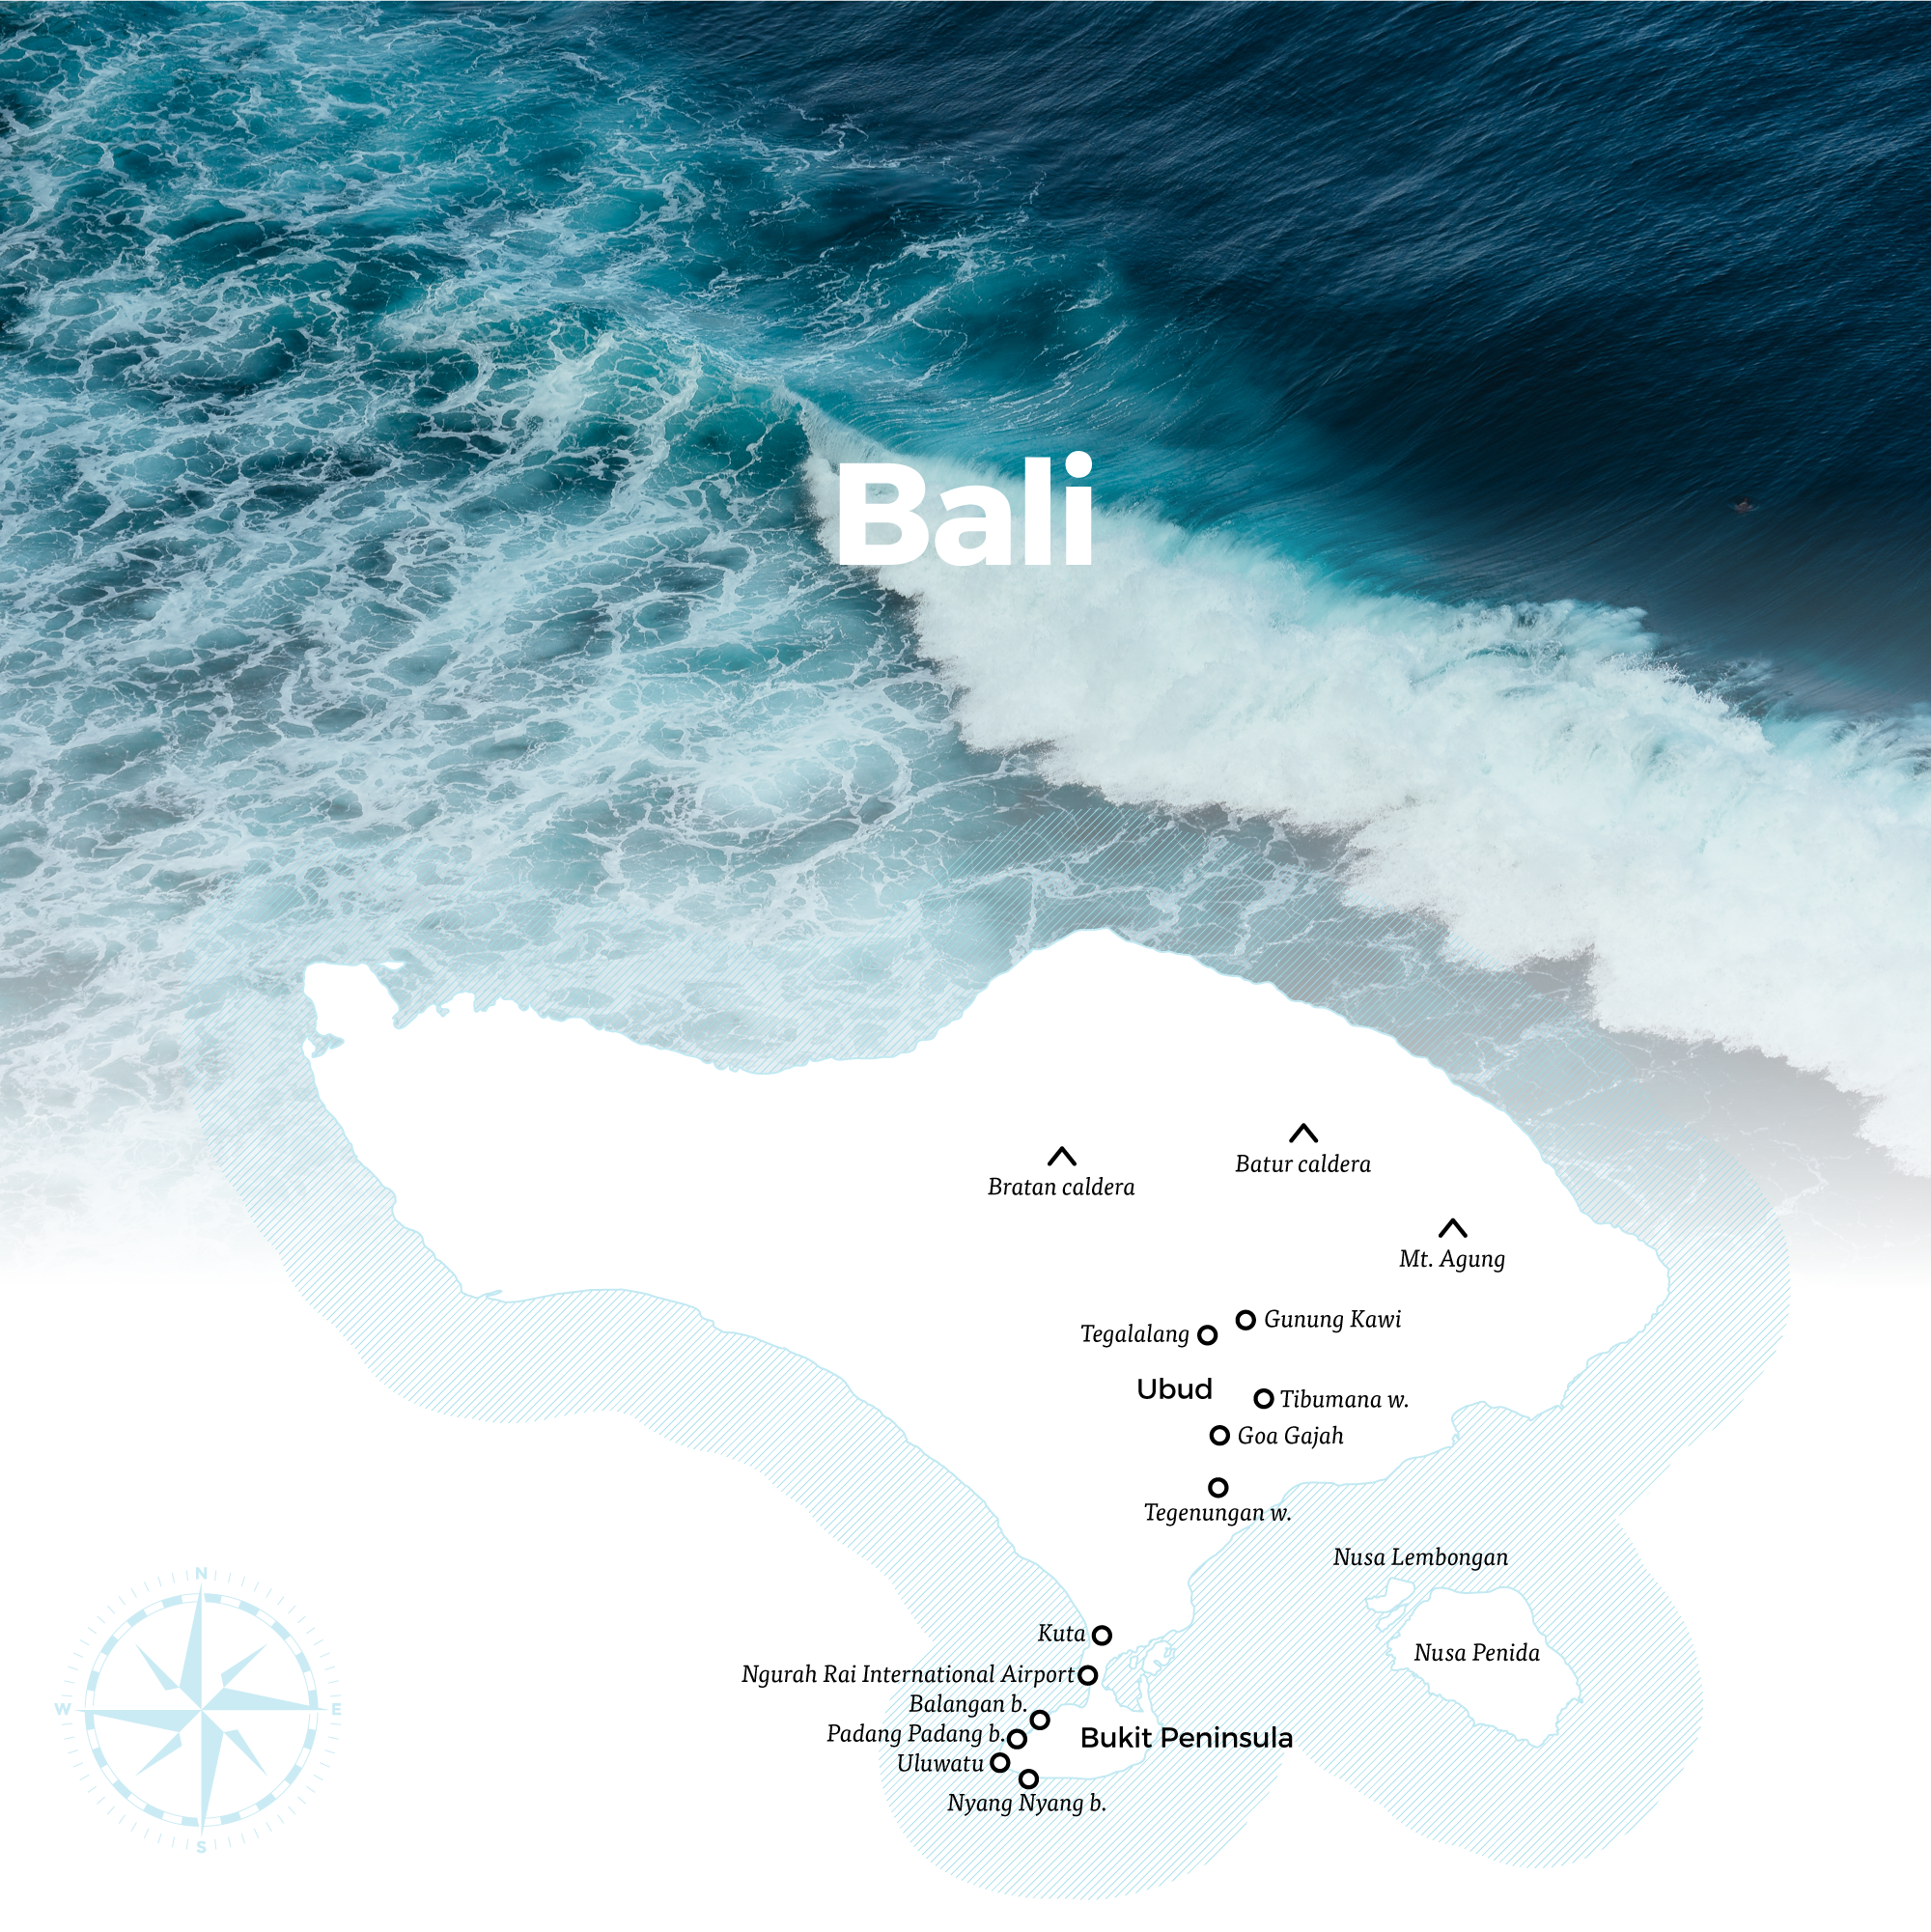 Bali map.png